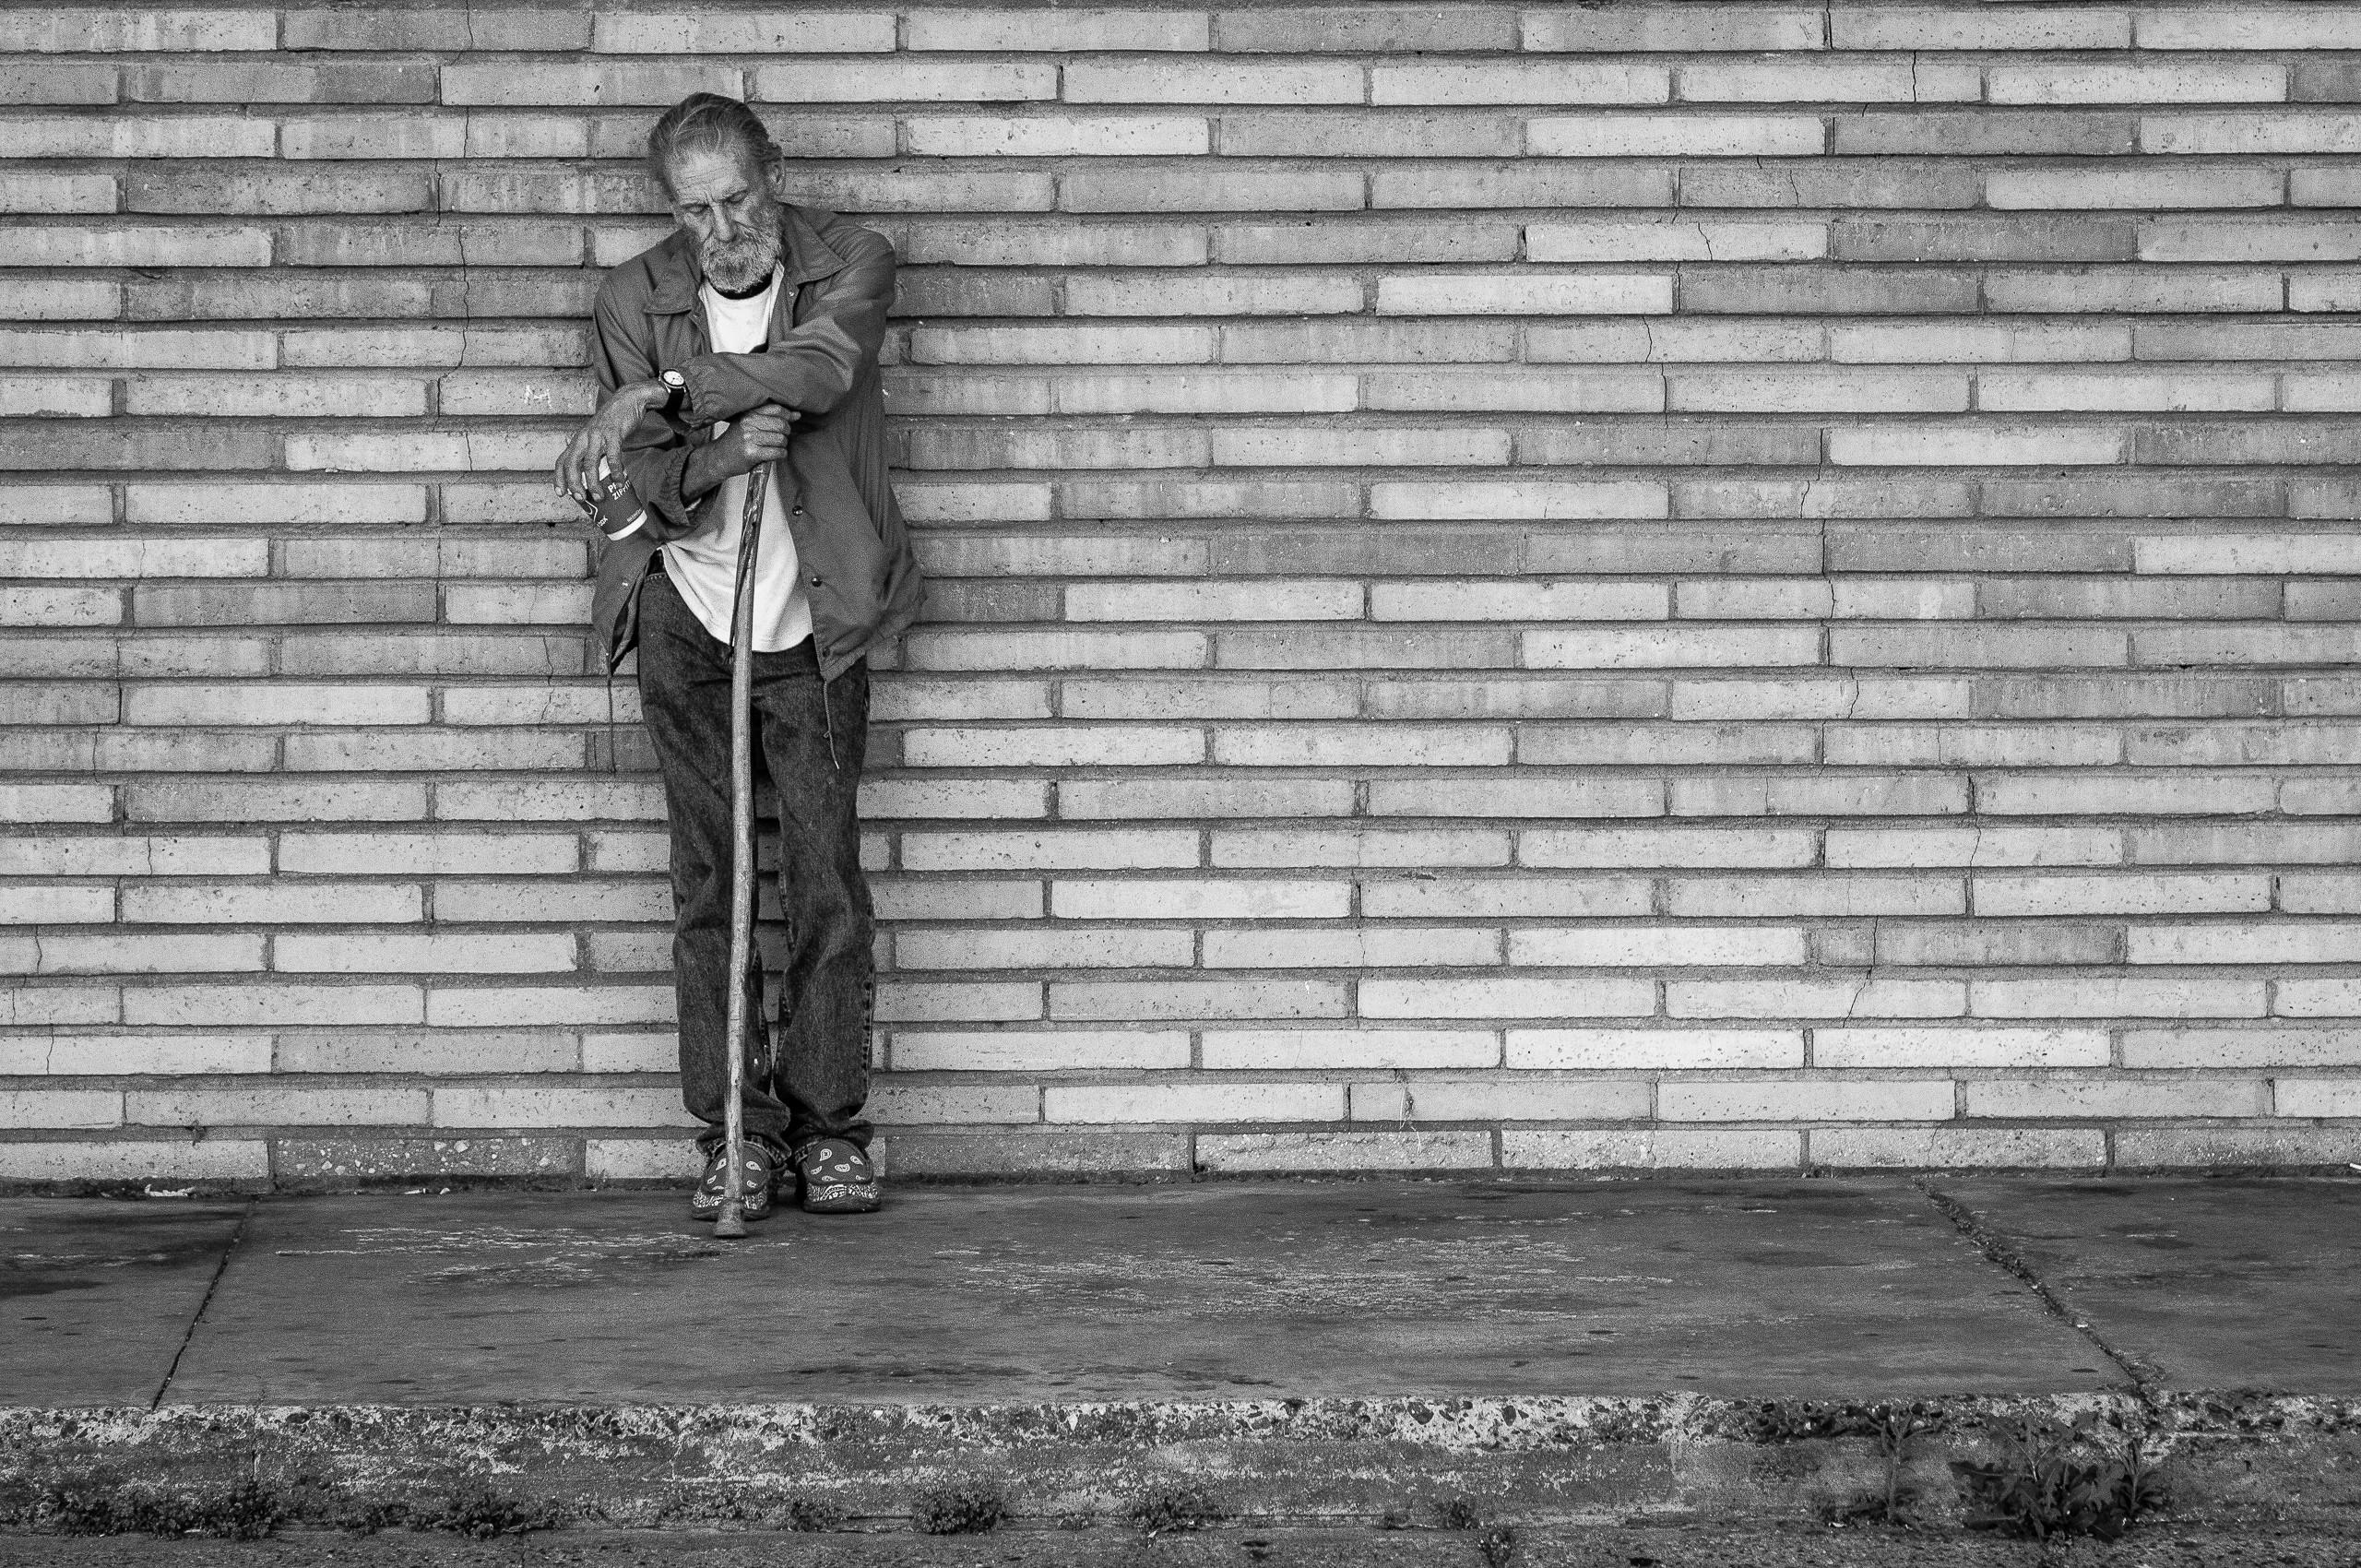 A Homeless Man Waits